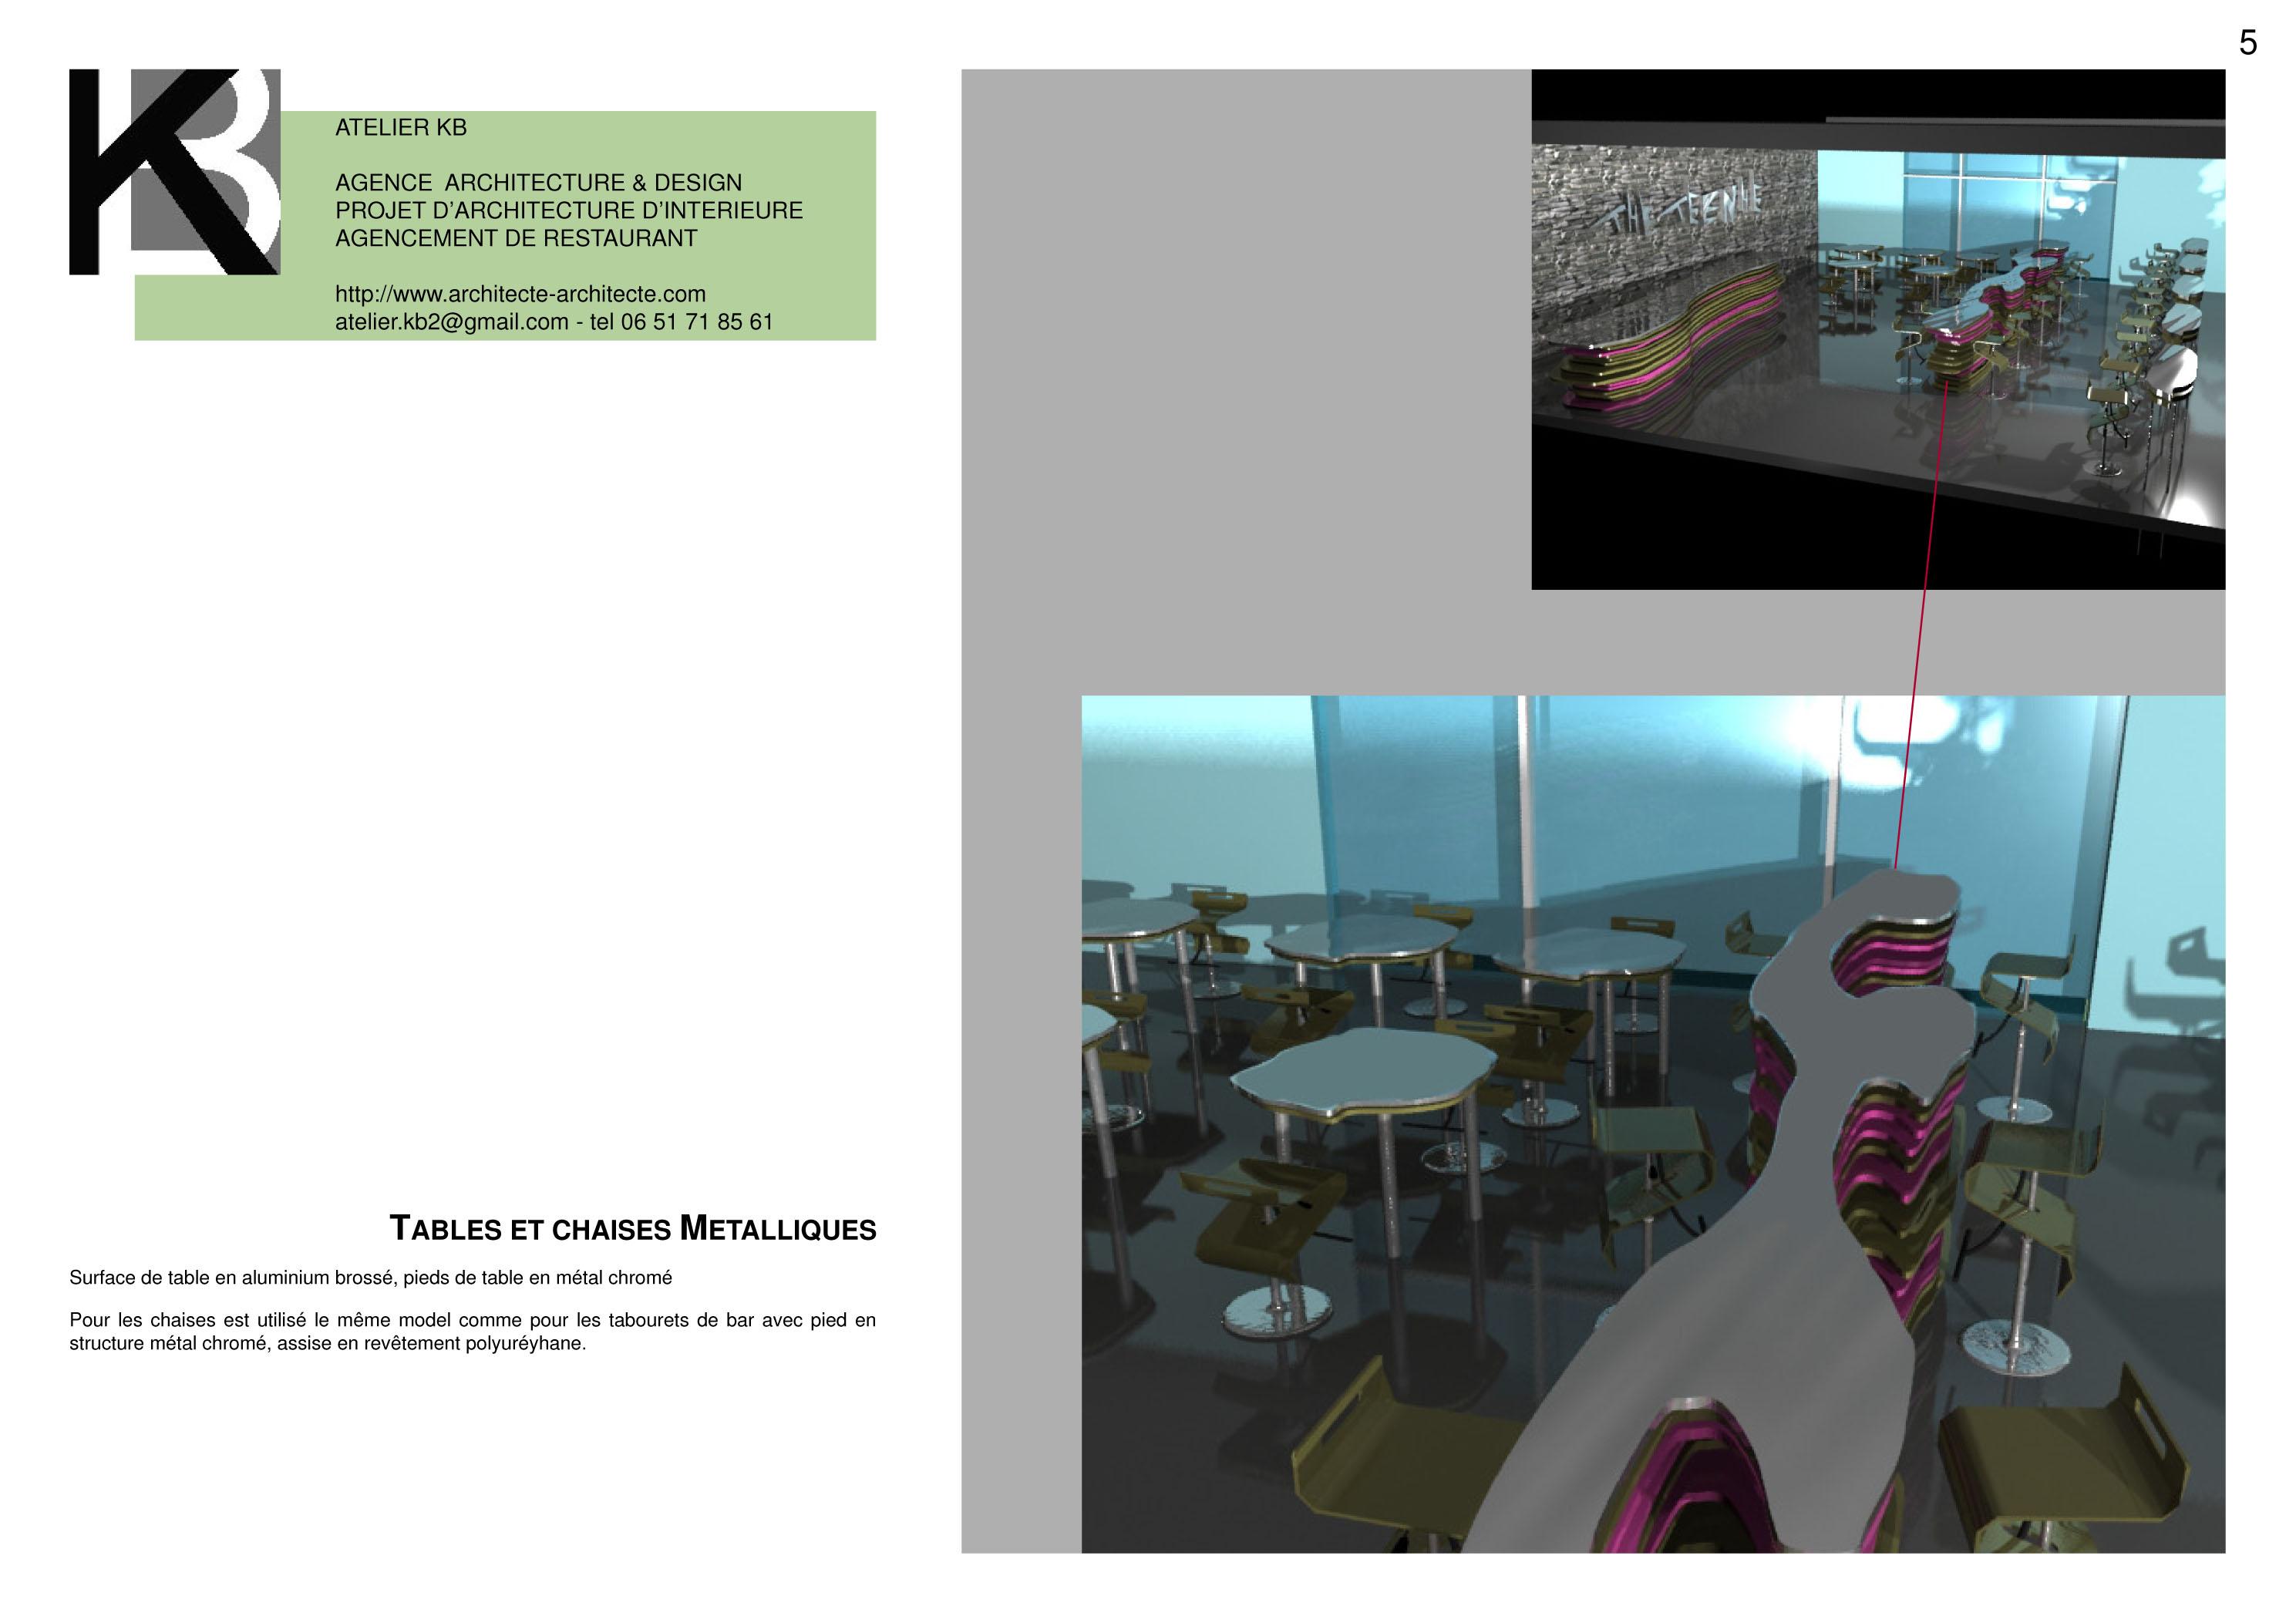 Architecte restaurant for Architecte interieur restaurant